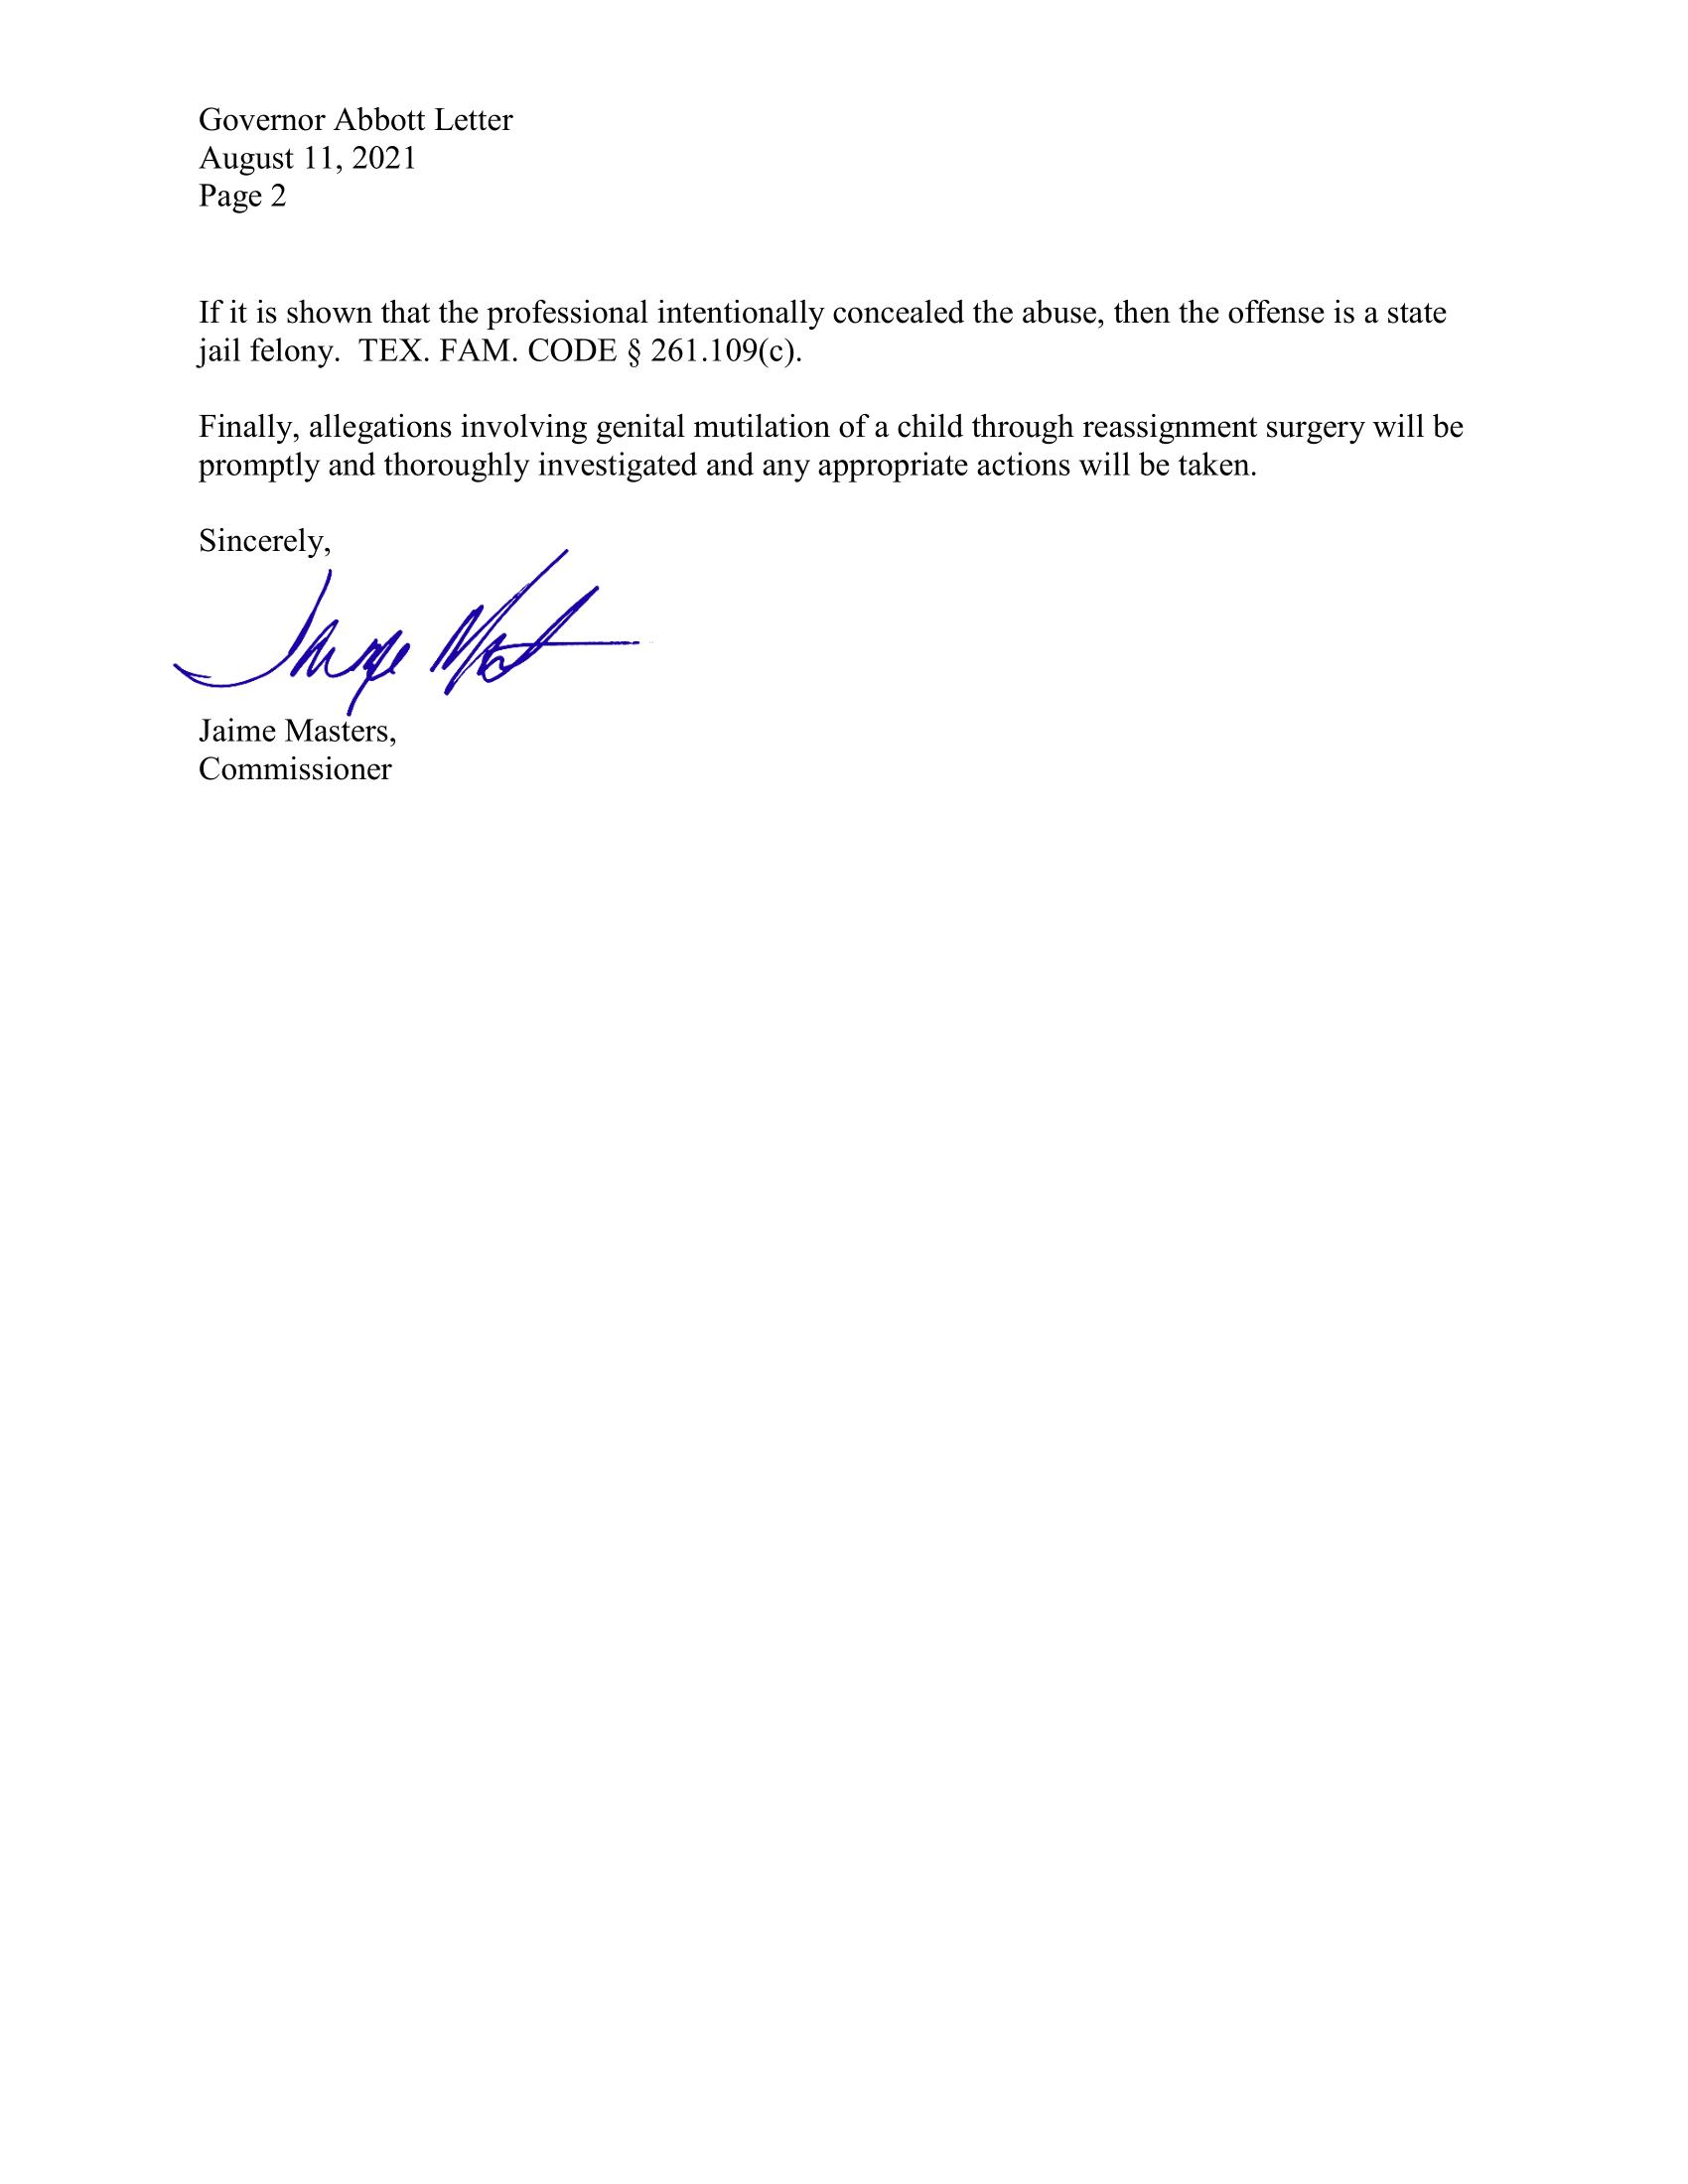 DFPS letter to Texas Gov. Credit: DFPS